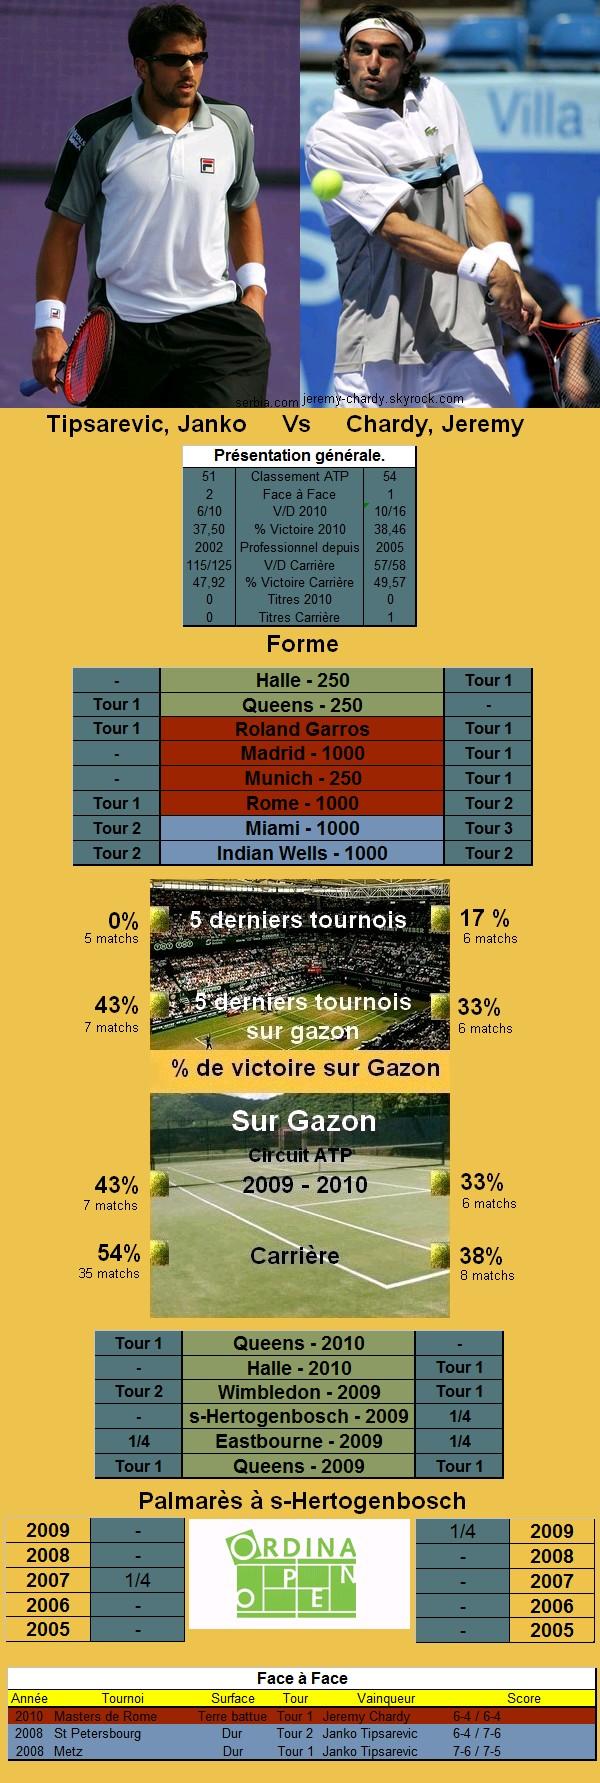 Statistiques tennis de Tipsarevic contre Chardy a s-Hertogenbosch